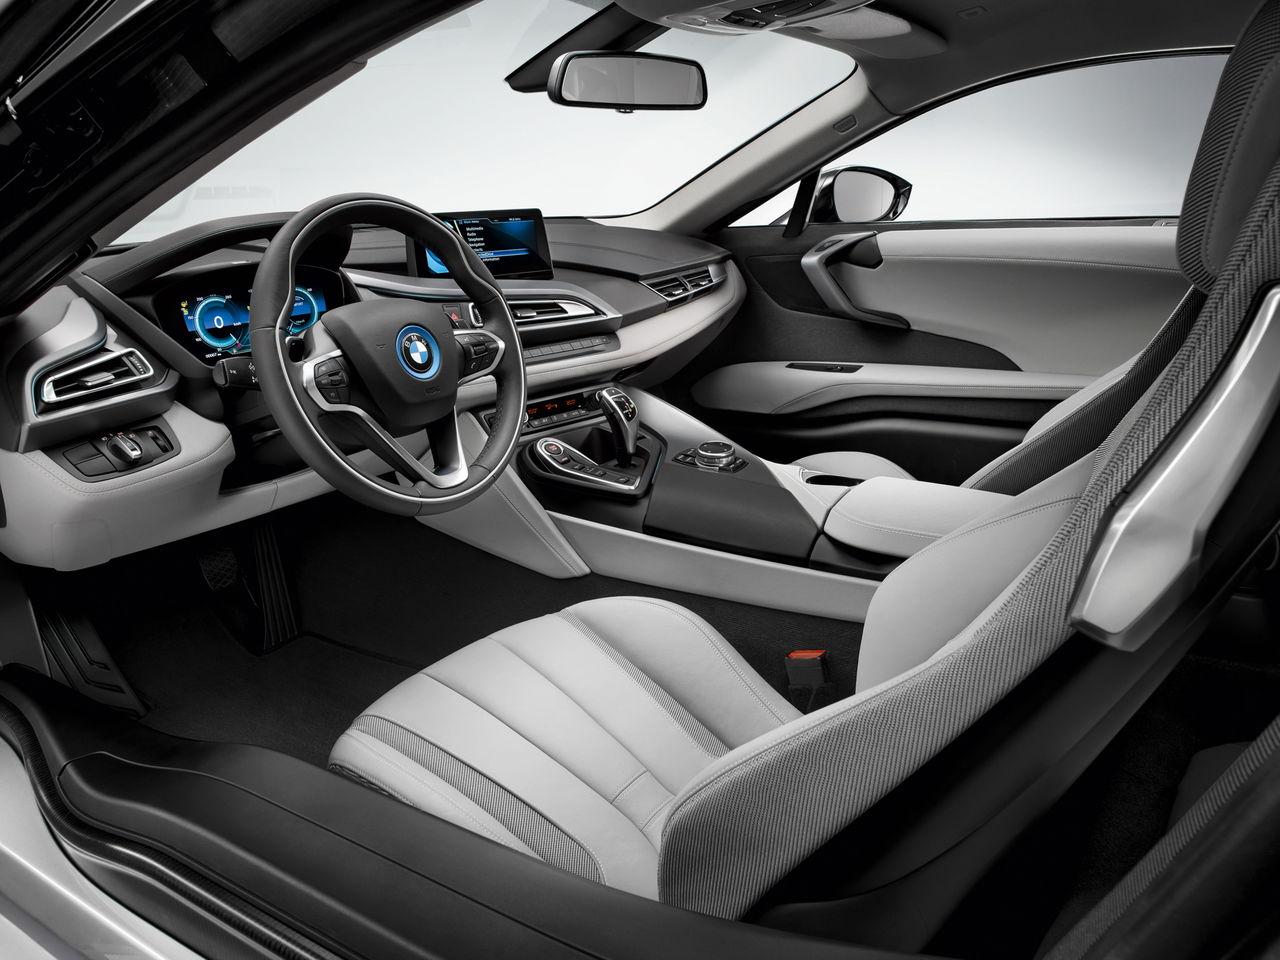 BMW i8 фотографии салона interior salon photo